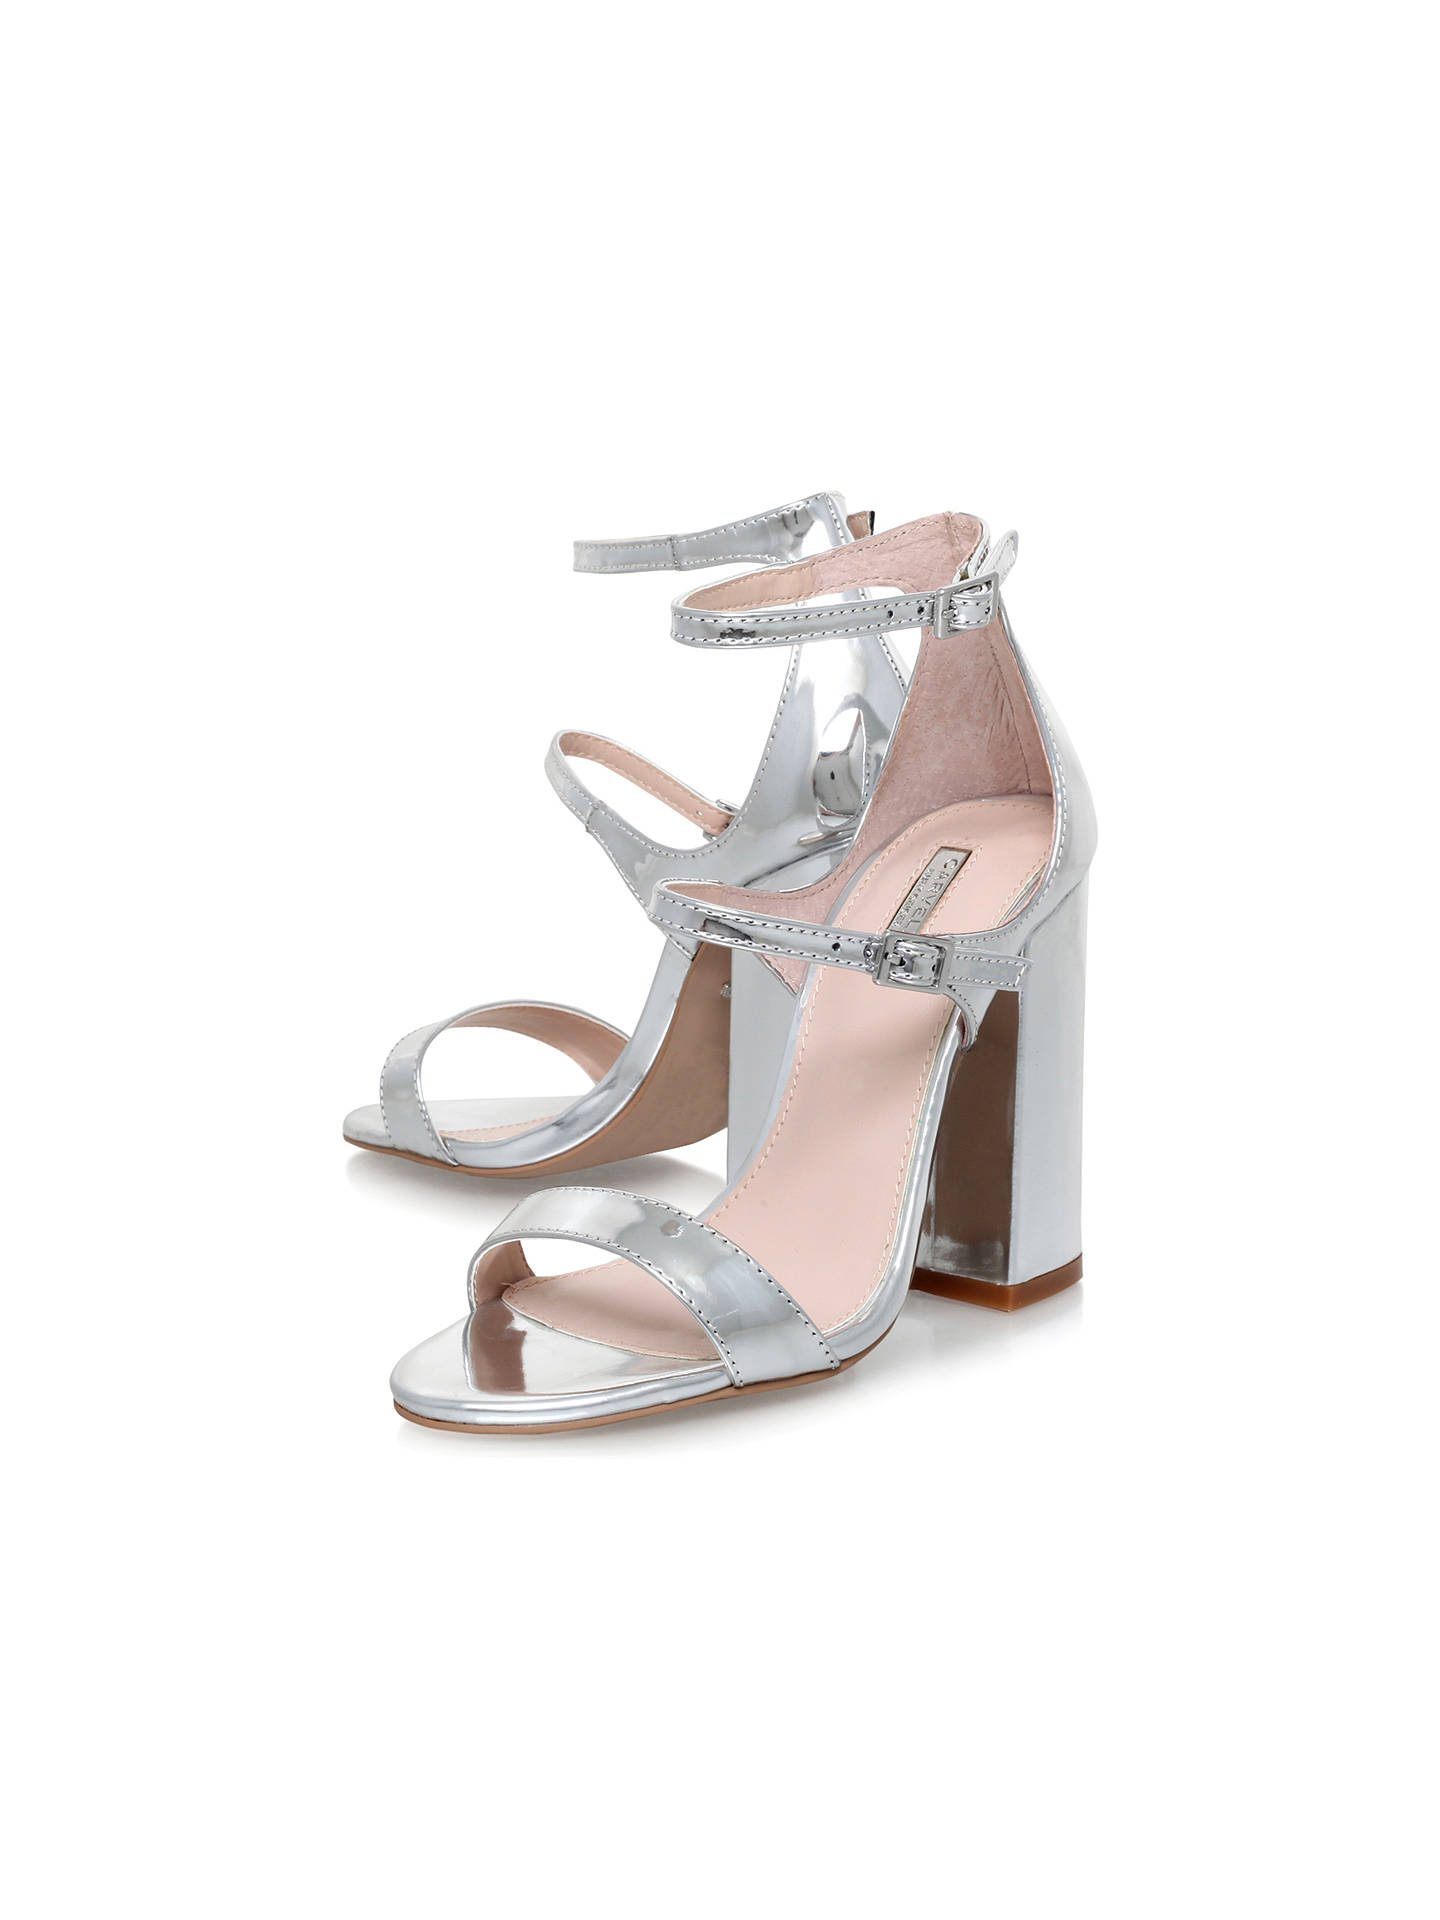 2e6049c1540 Carvela Genetic Double Strap Block Heeled Sandals at John Lewis ...